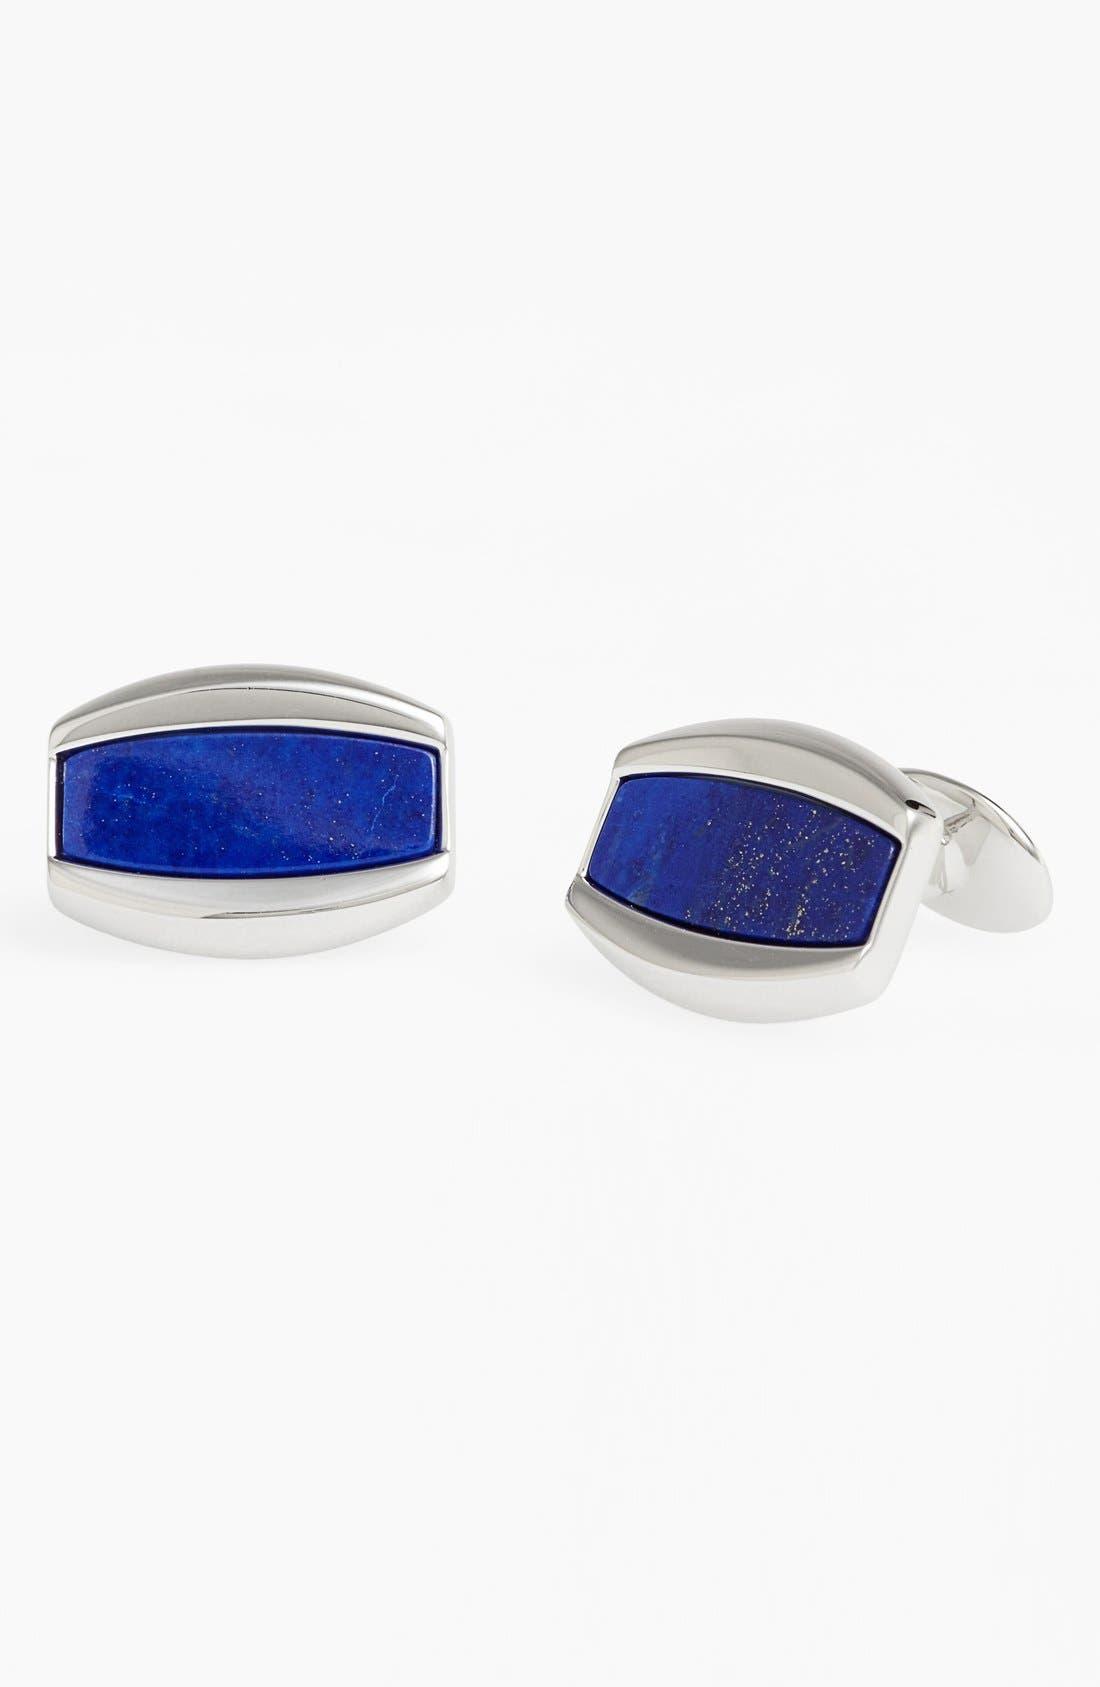 Lapis Lazuli Cuff Links,                             Main thumbnail 1, color,                             SILVER/ BLUE